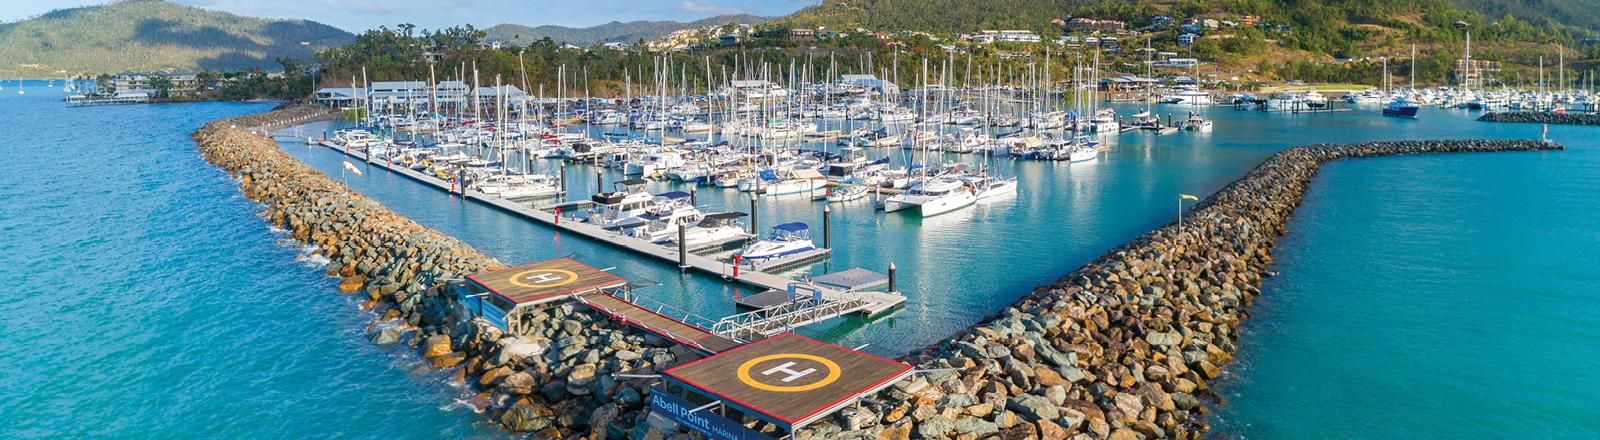 Abell Point Marina News